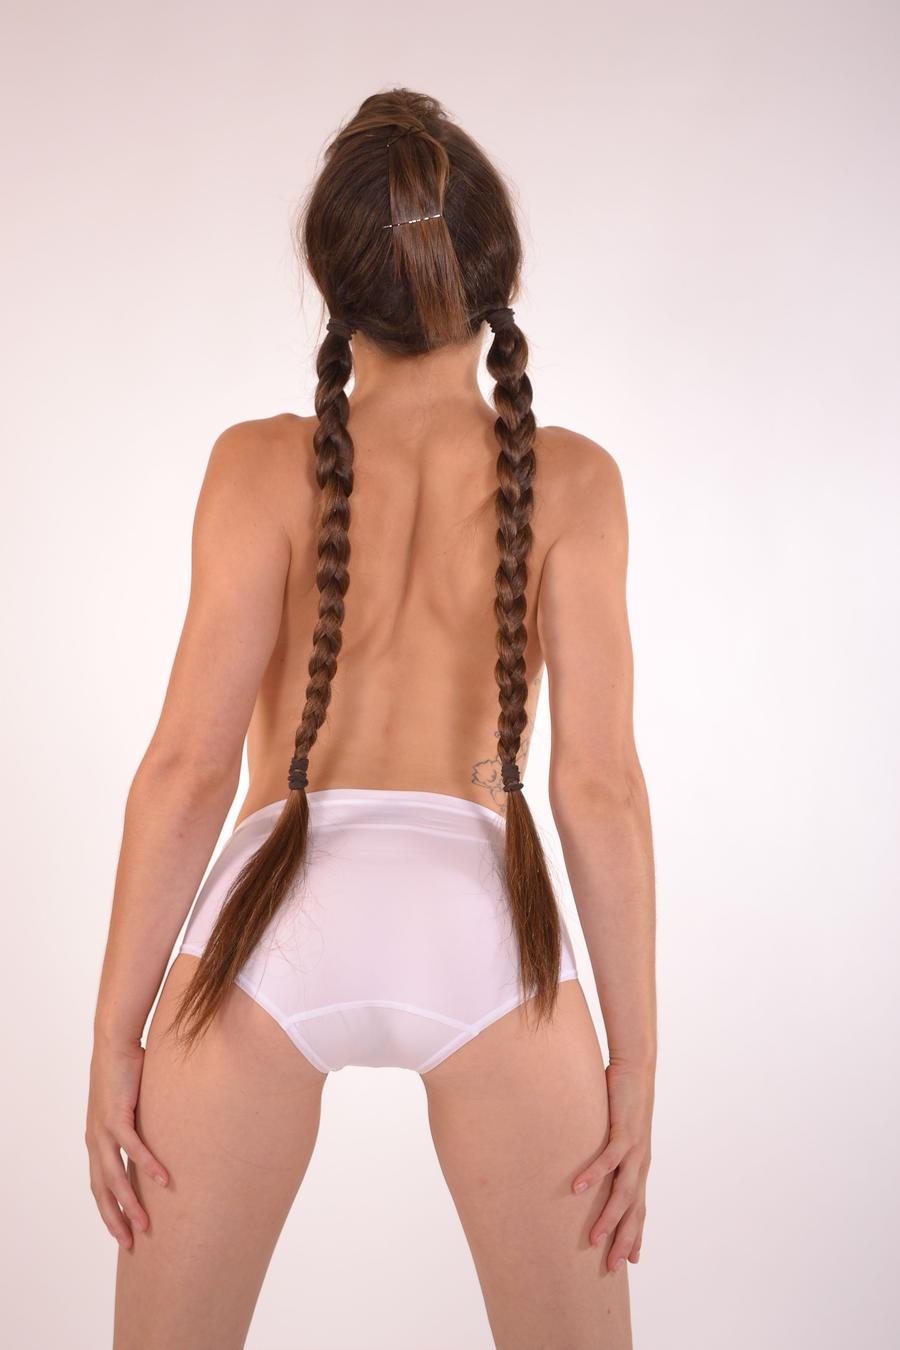 Filipina lady nude